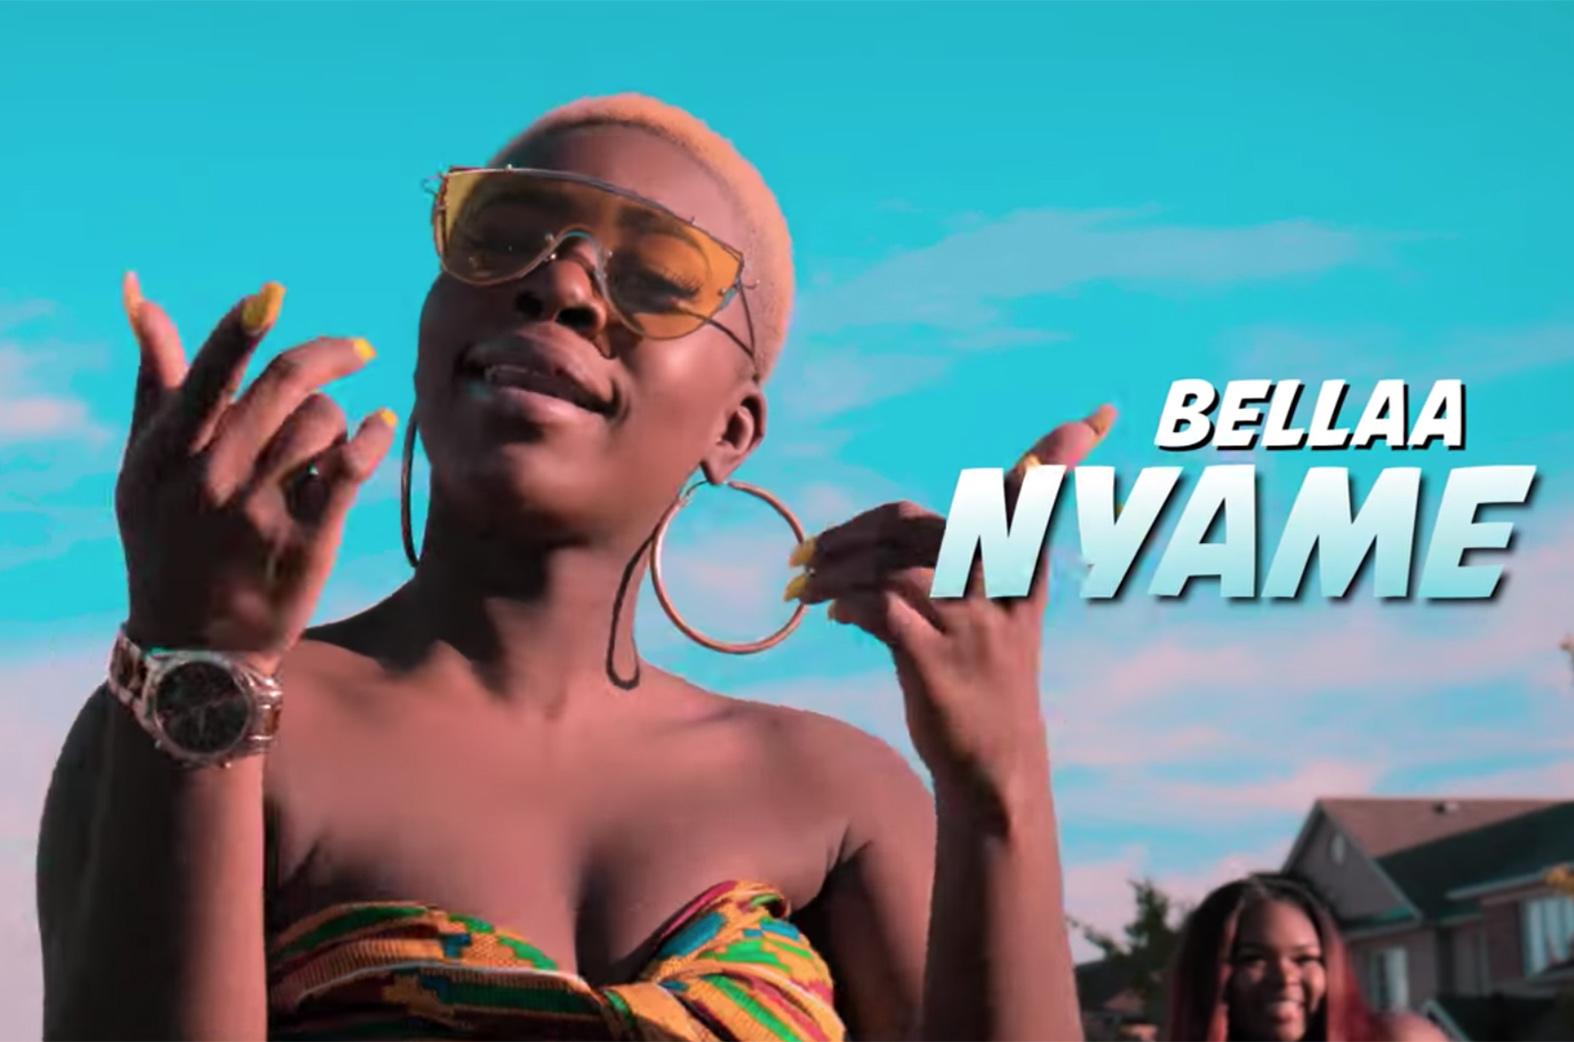 Bella Nyame by Bella Tee